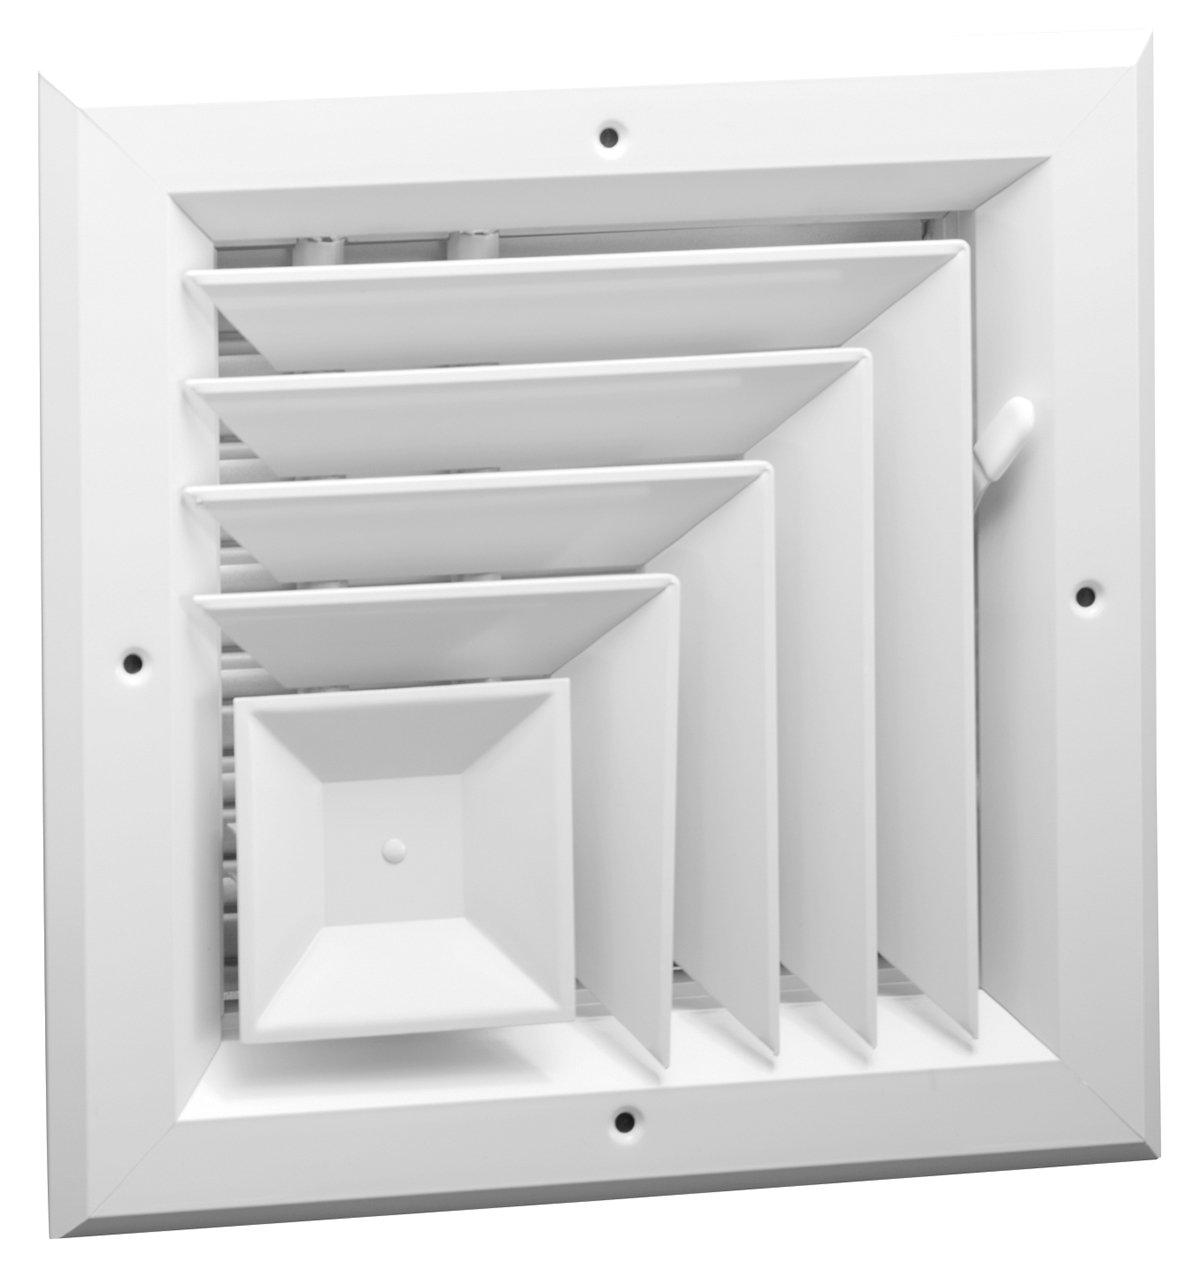 14'' x 14'' - 2 Way Corner Direction Extruded Aluminum Ceiling Diffuser Square - HVAC Vent Cover